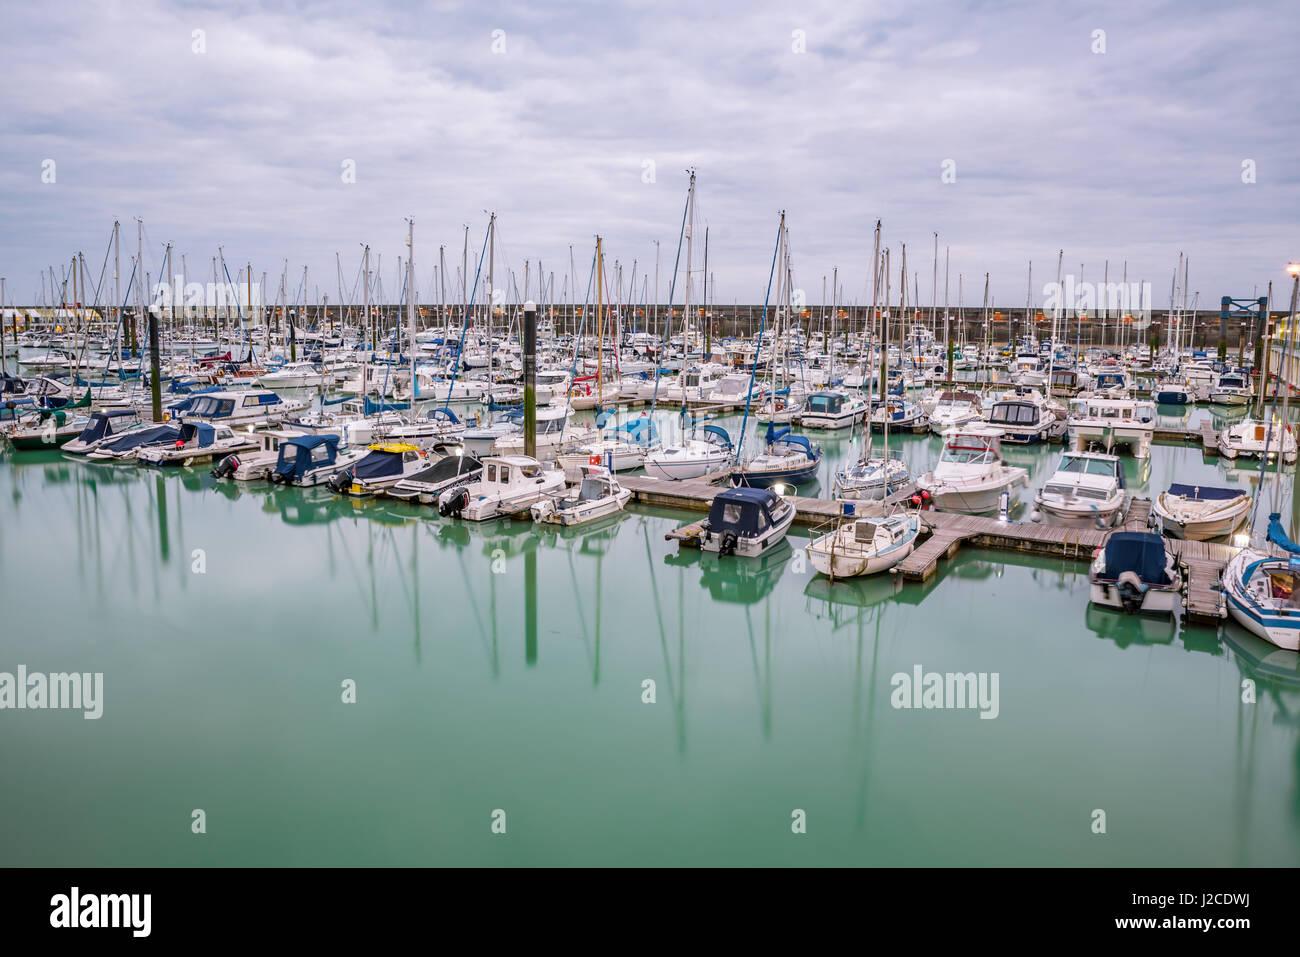 Boats, yachts, and fishing boats moored at Brighton Marina docs on a cloudy day. - Stock Image